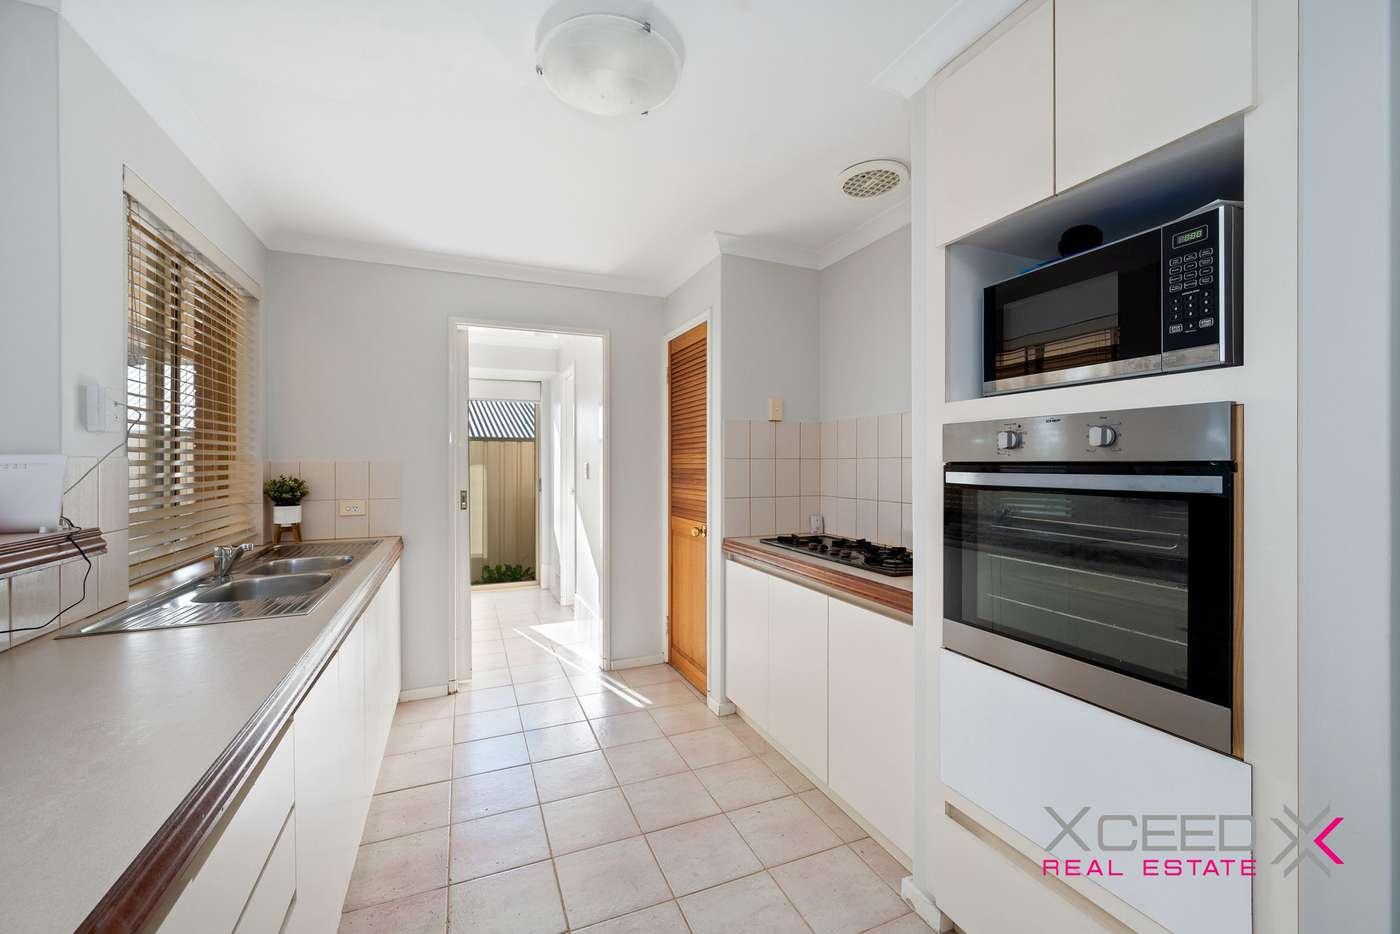 Seventh view of Homely house listing, 42 Glendevon Turn, Kinross WA 6028